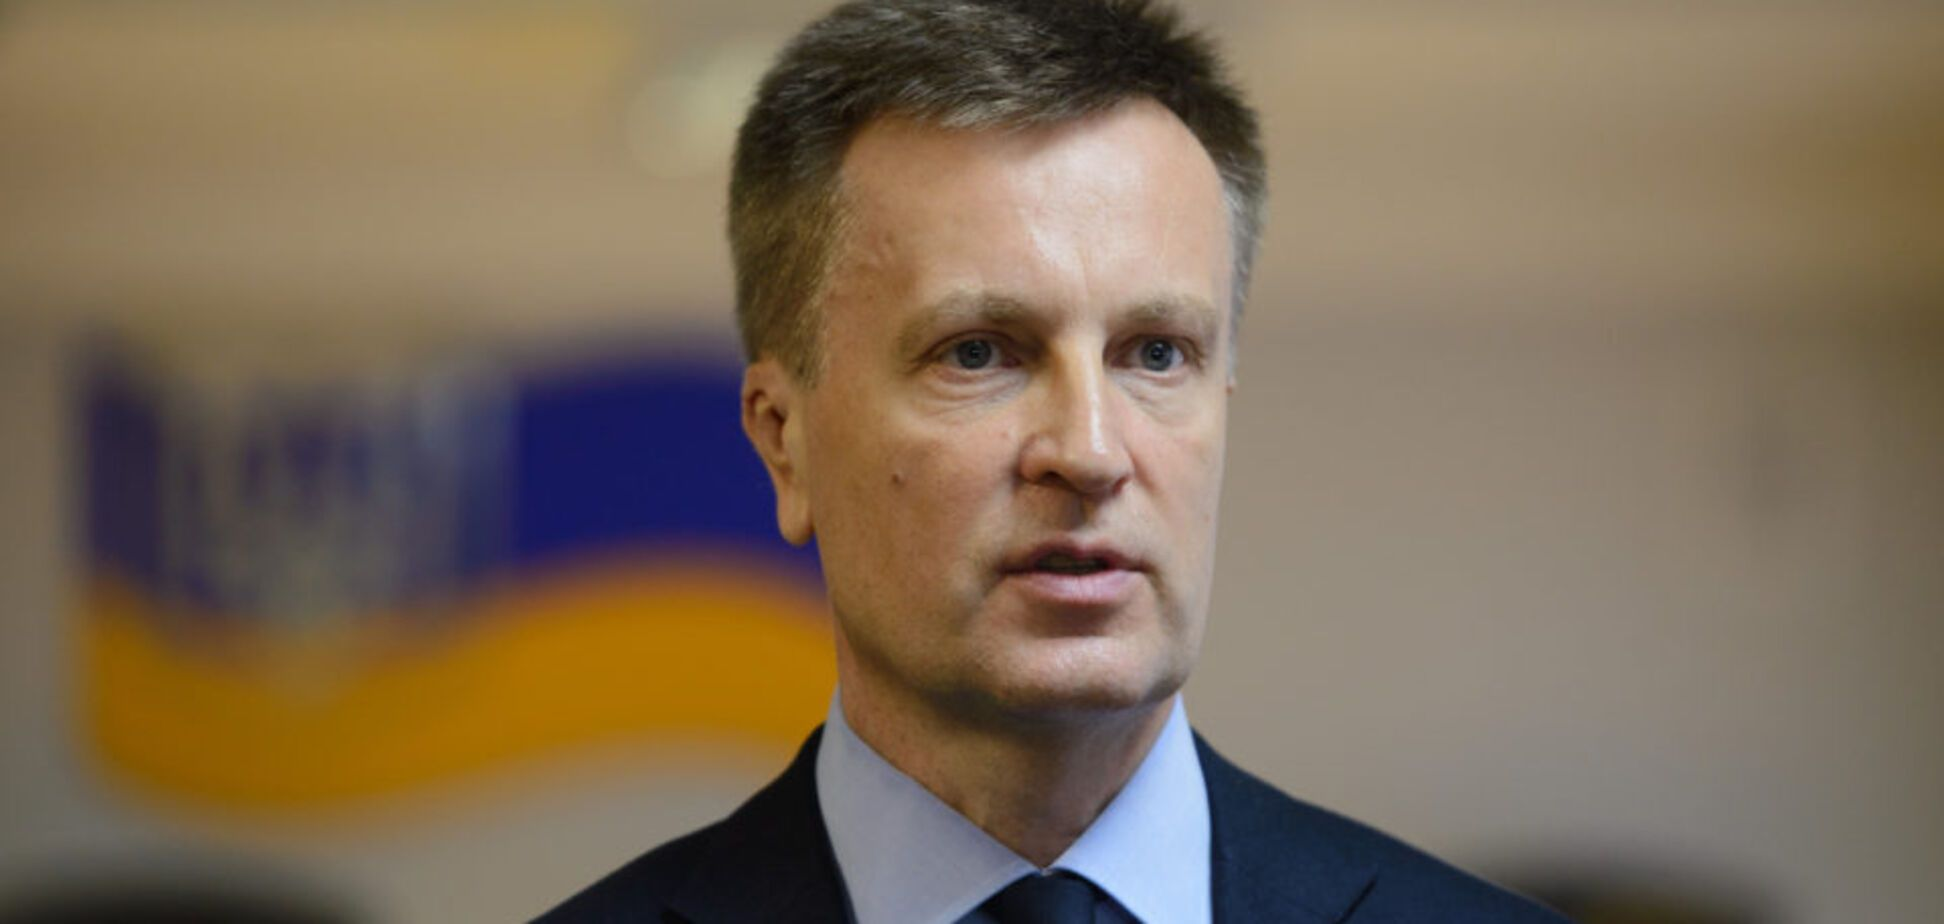 Семья председателя НКРЭКУ переоформила еще один бизнес на оффшор, – Наливайченко